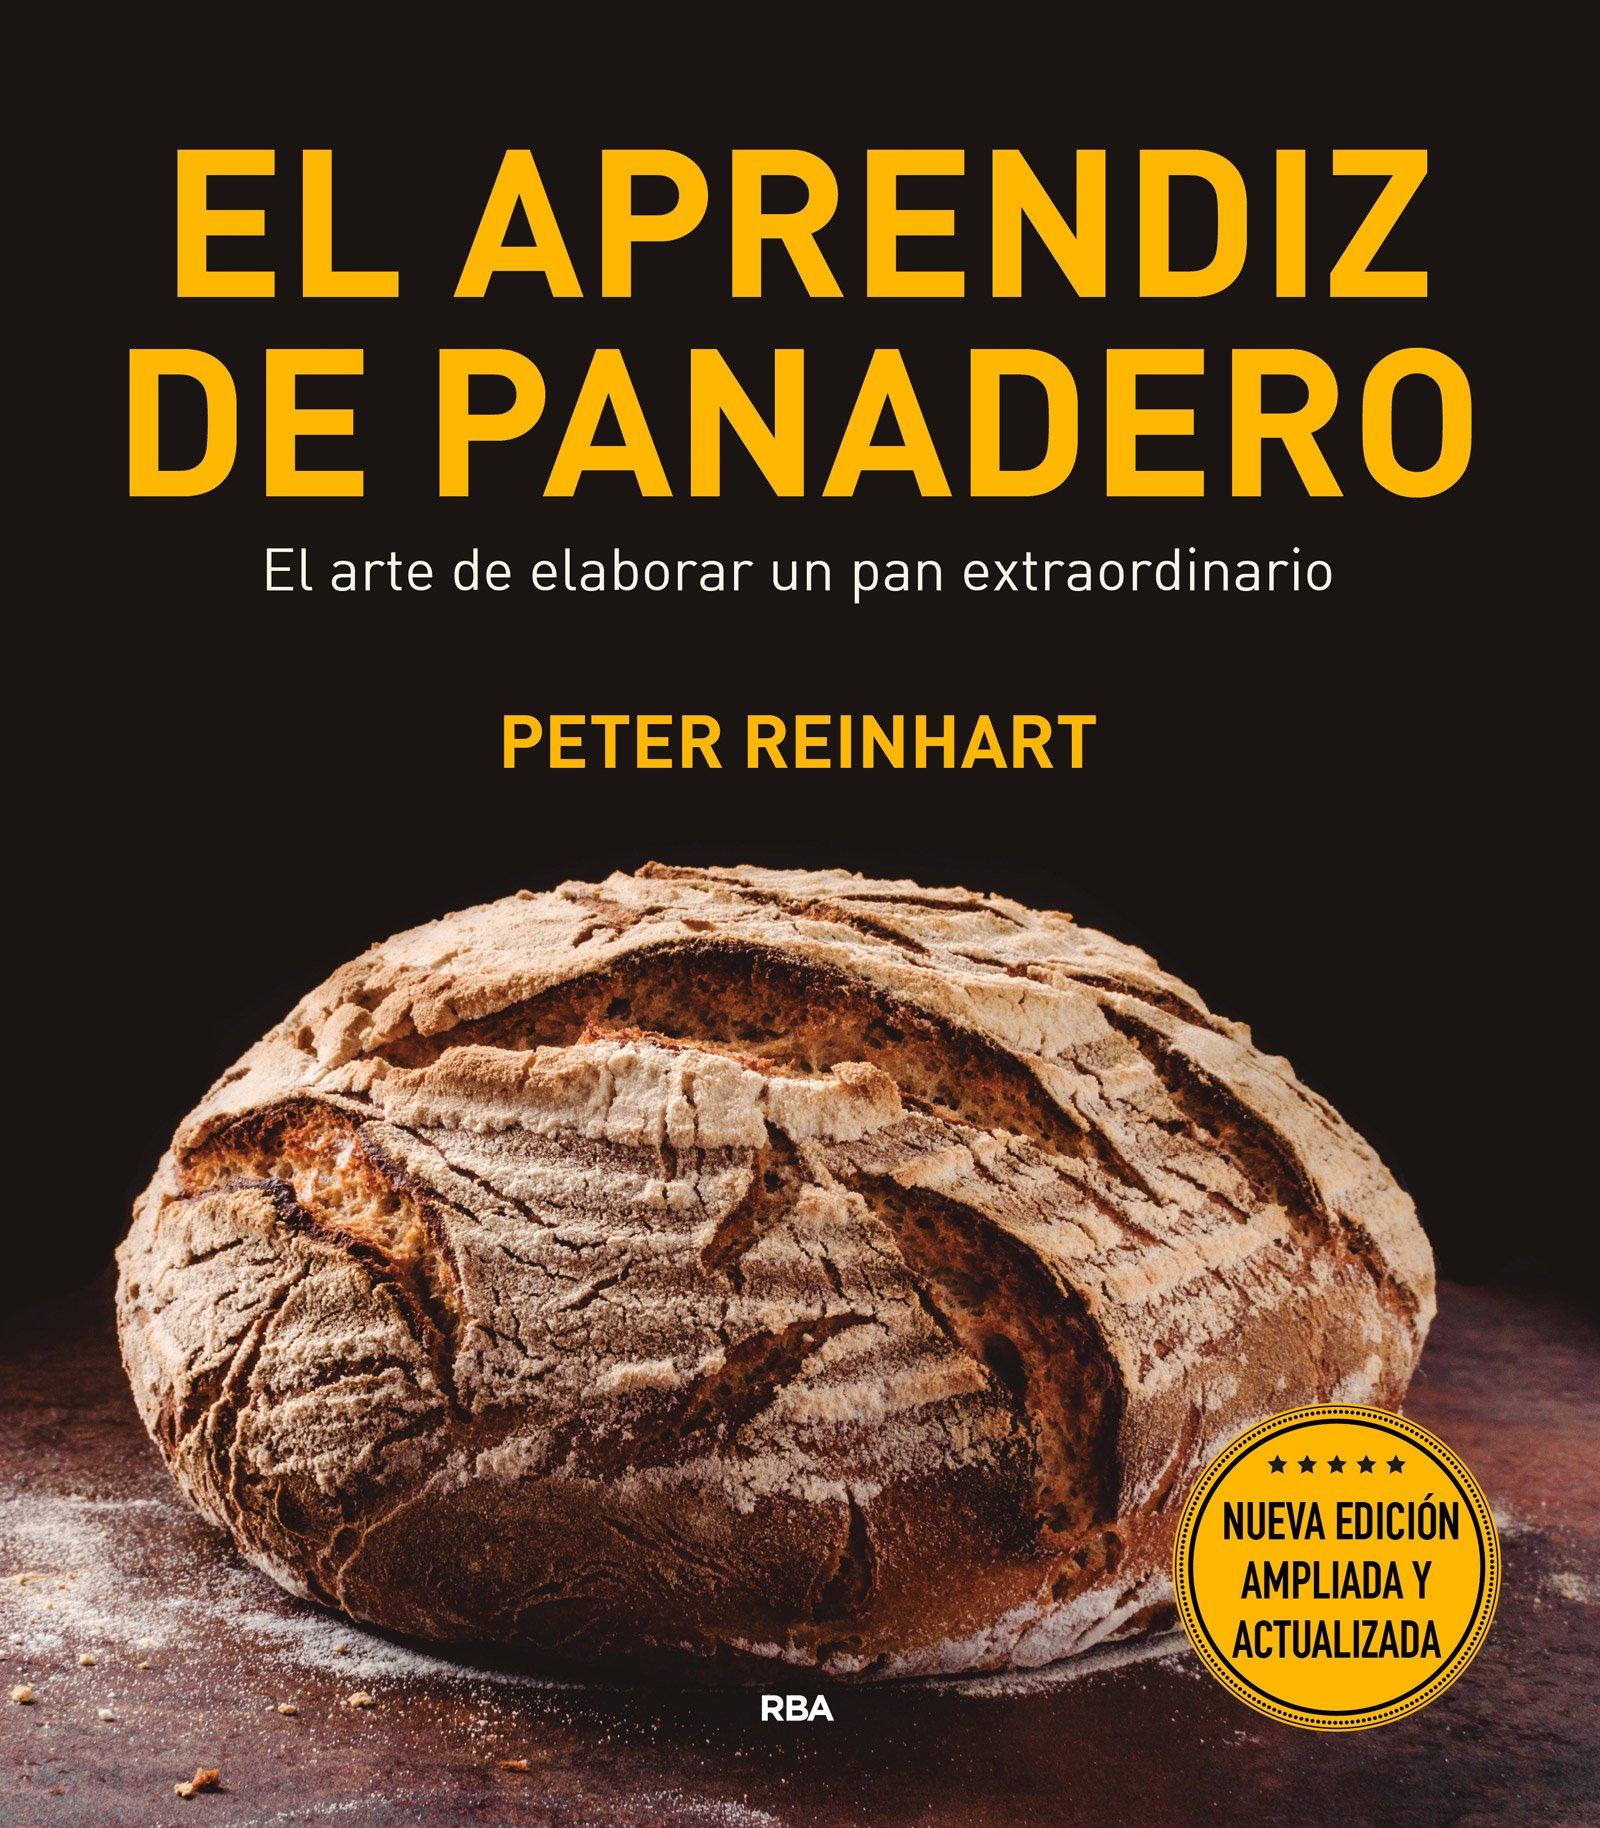 El aprendiz de panadero: PETER REINHART : 9788491180944 ...